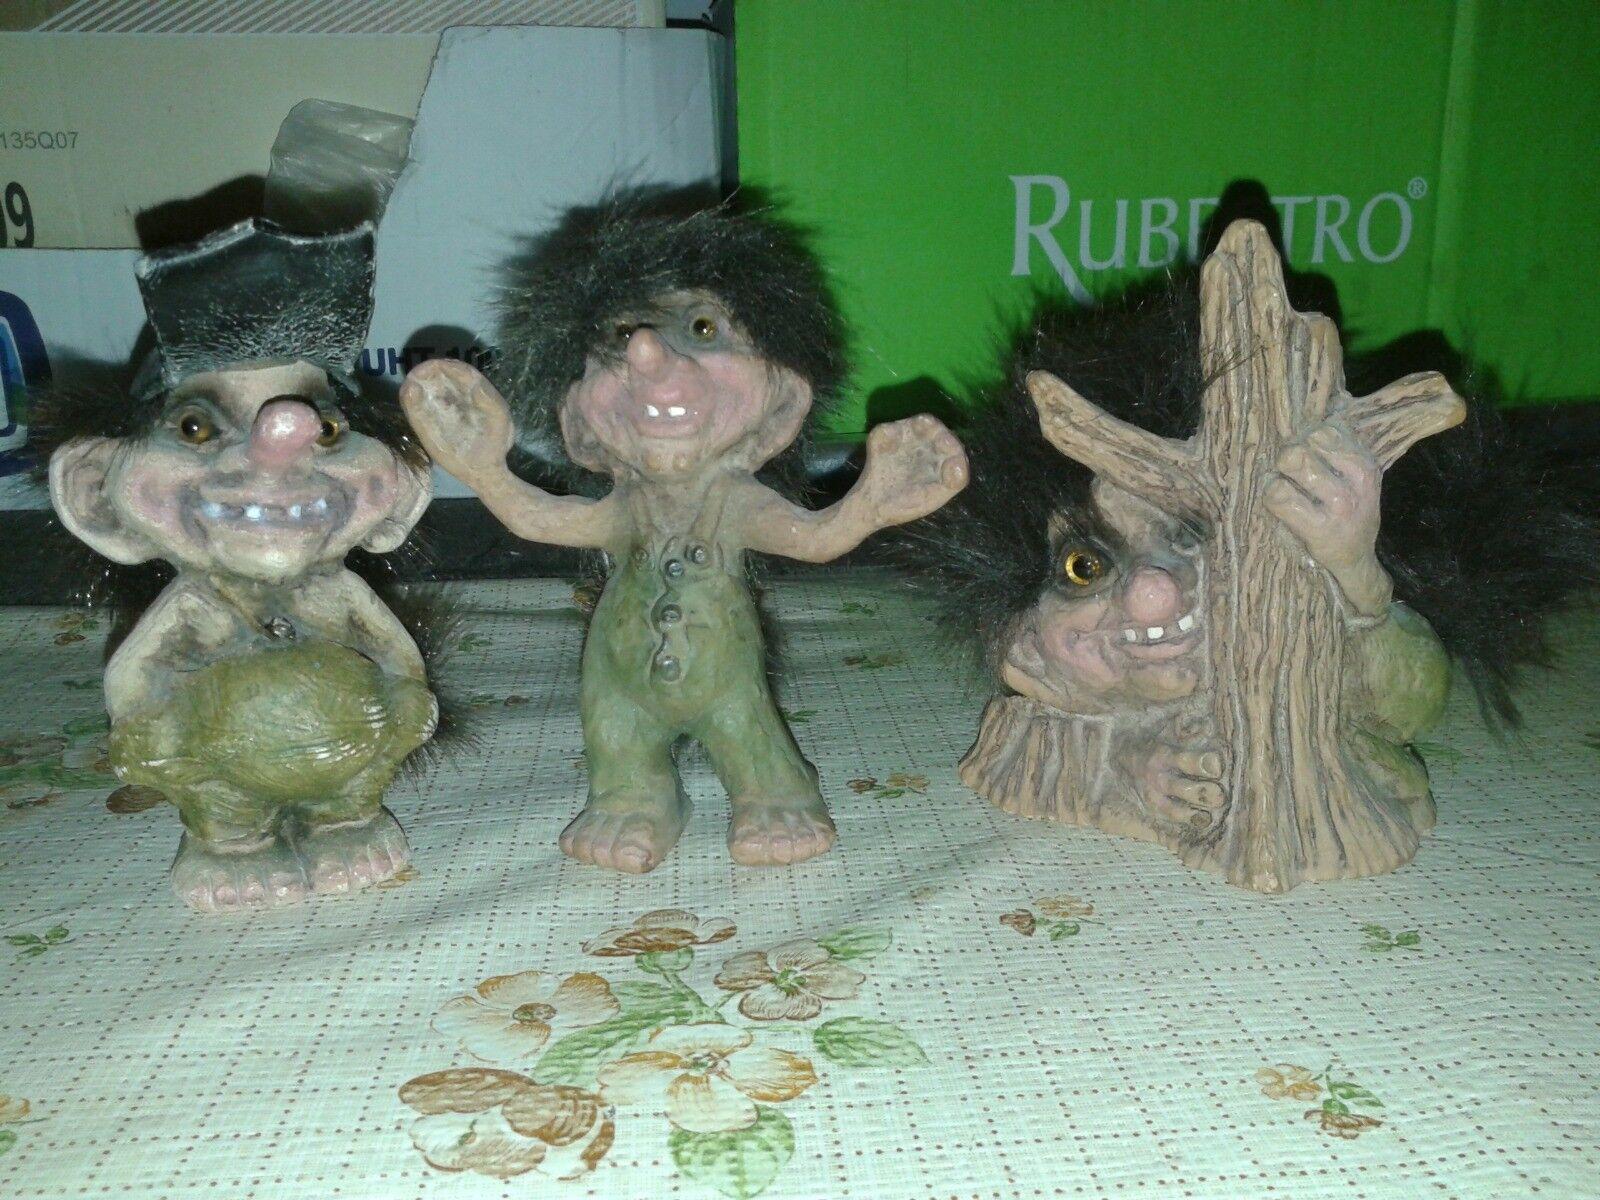 Tre troll norvegese usati (3 norvegian troll)